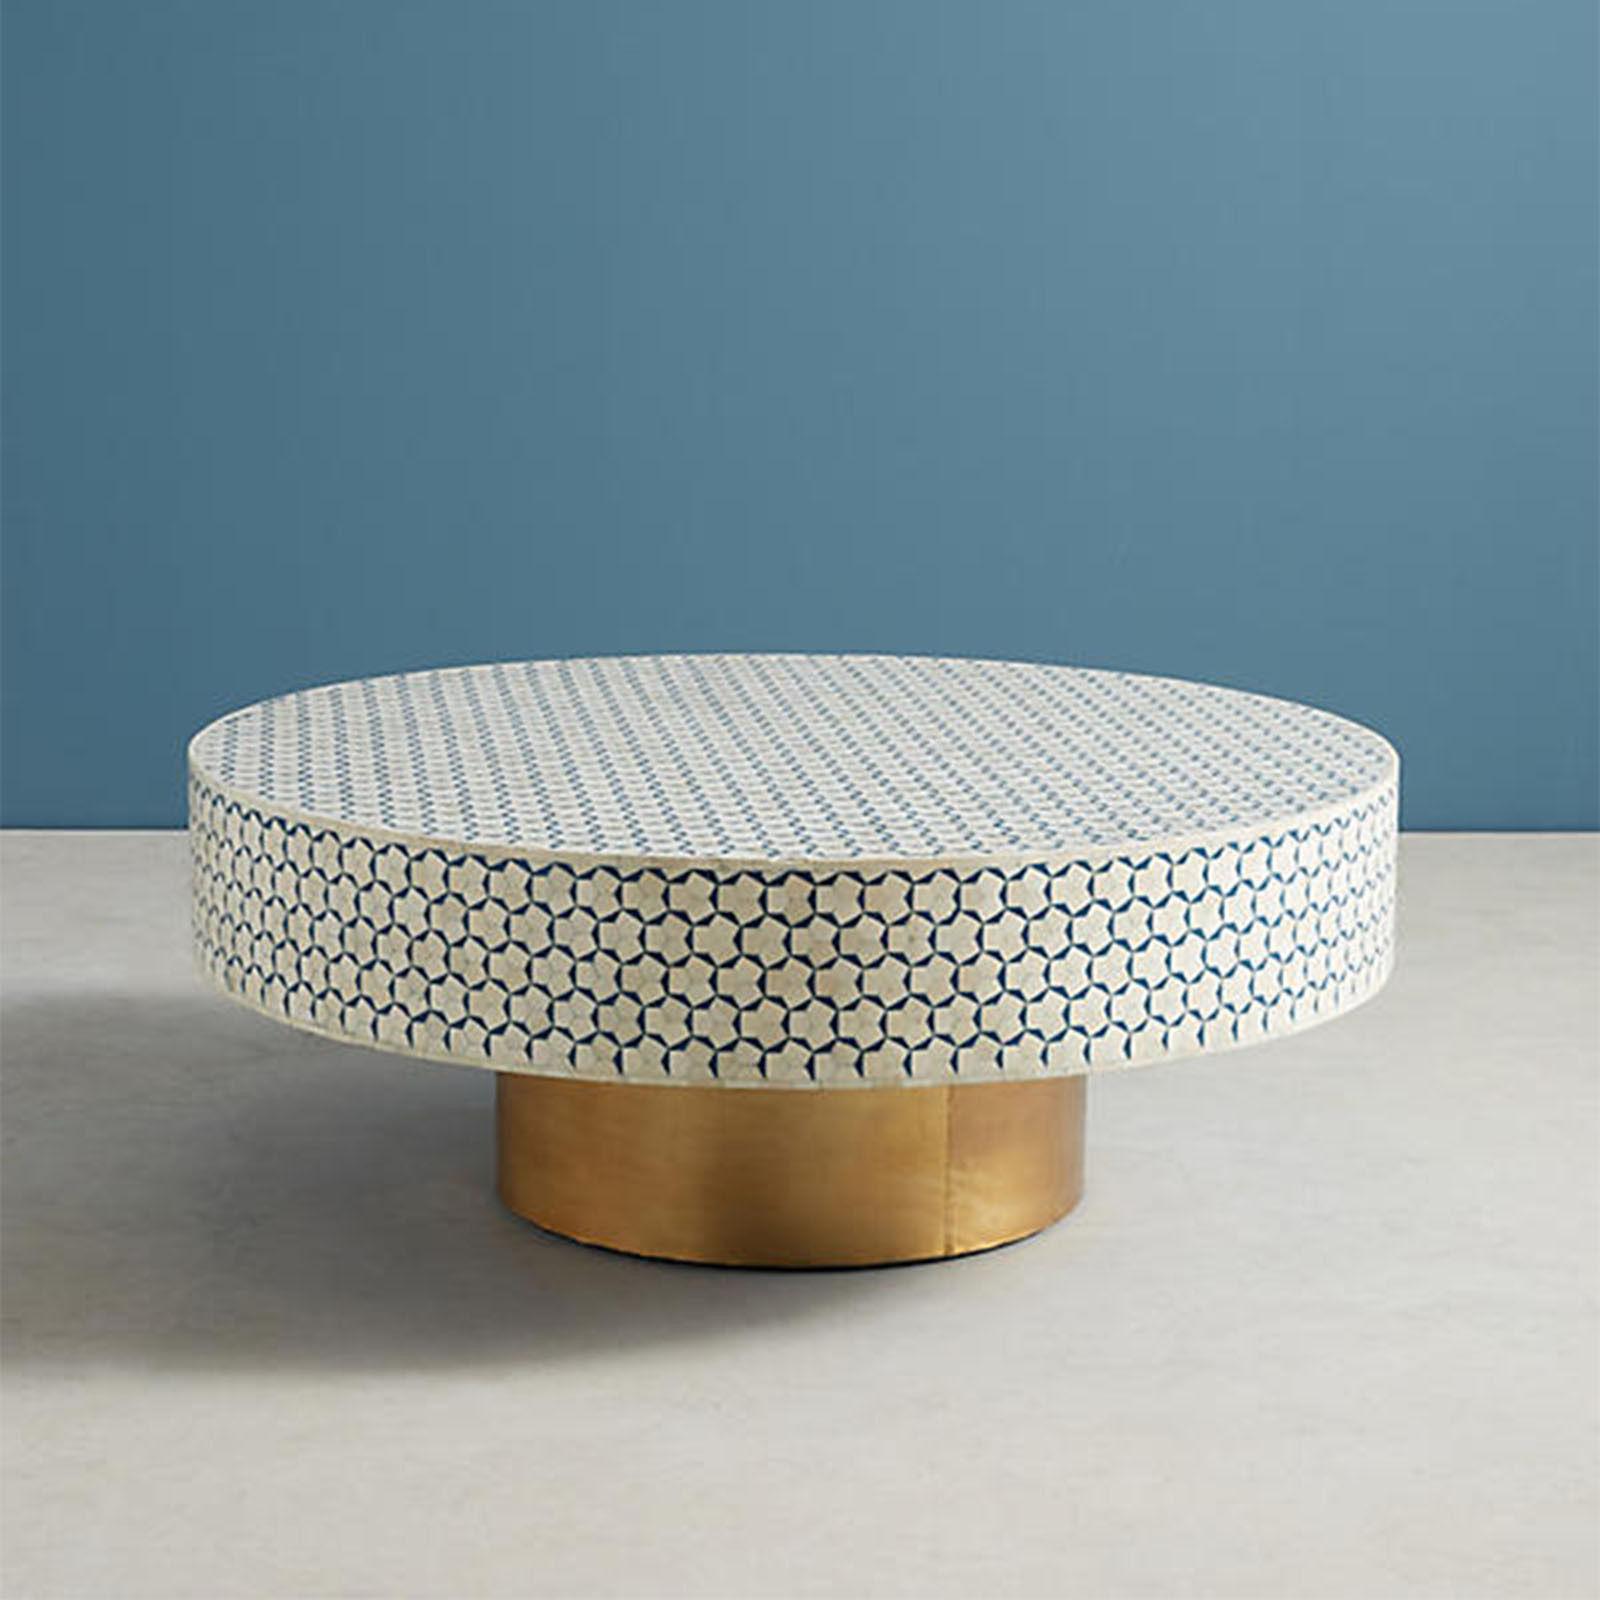 - Bone Inlay Small Targua Moroccan Coffee Table In Teal Green Color